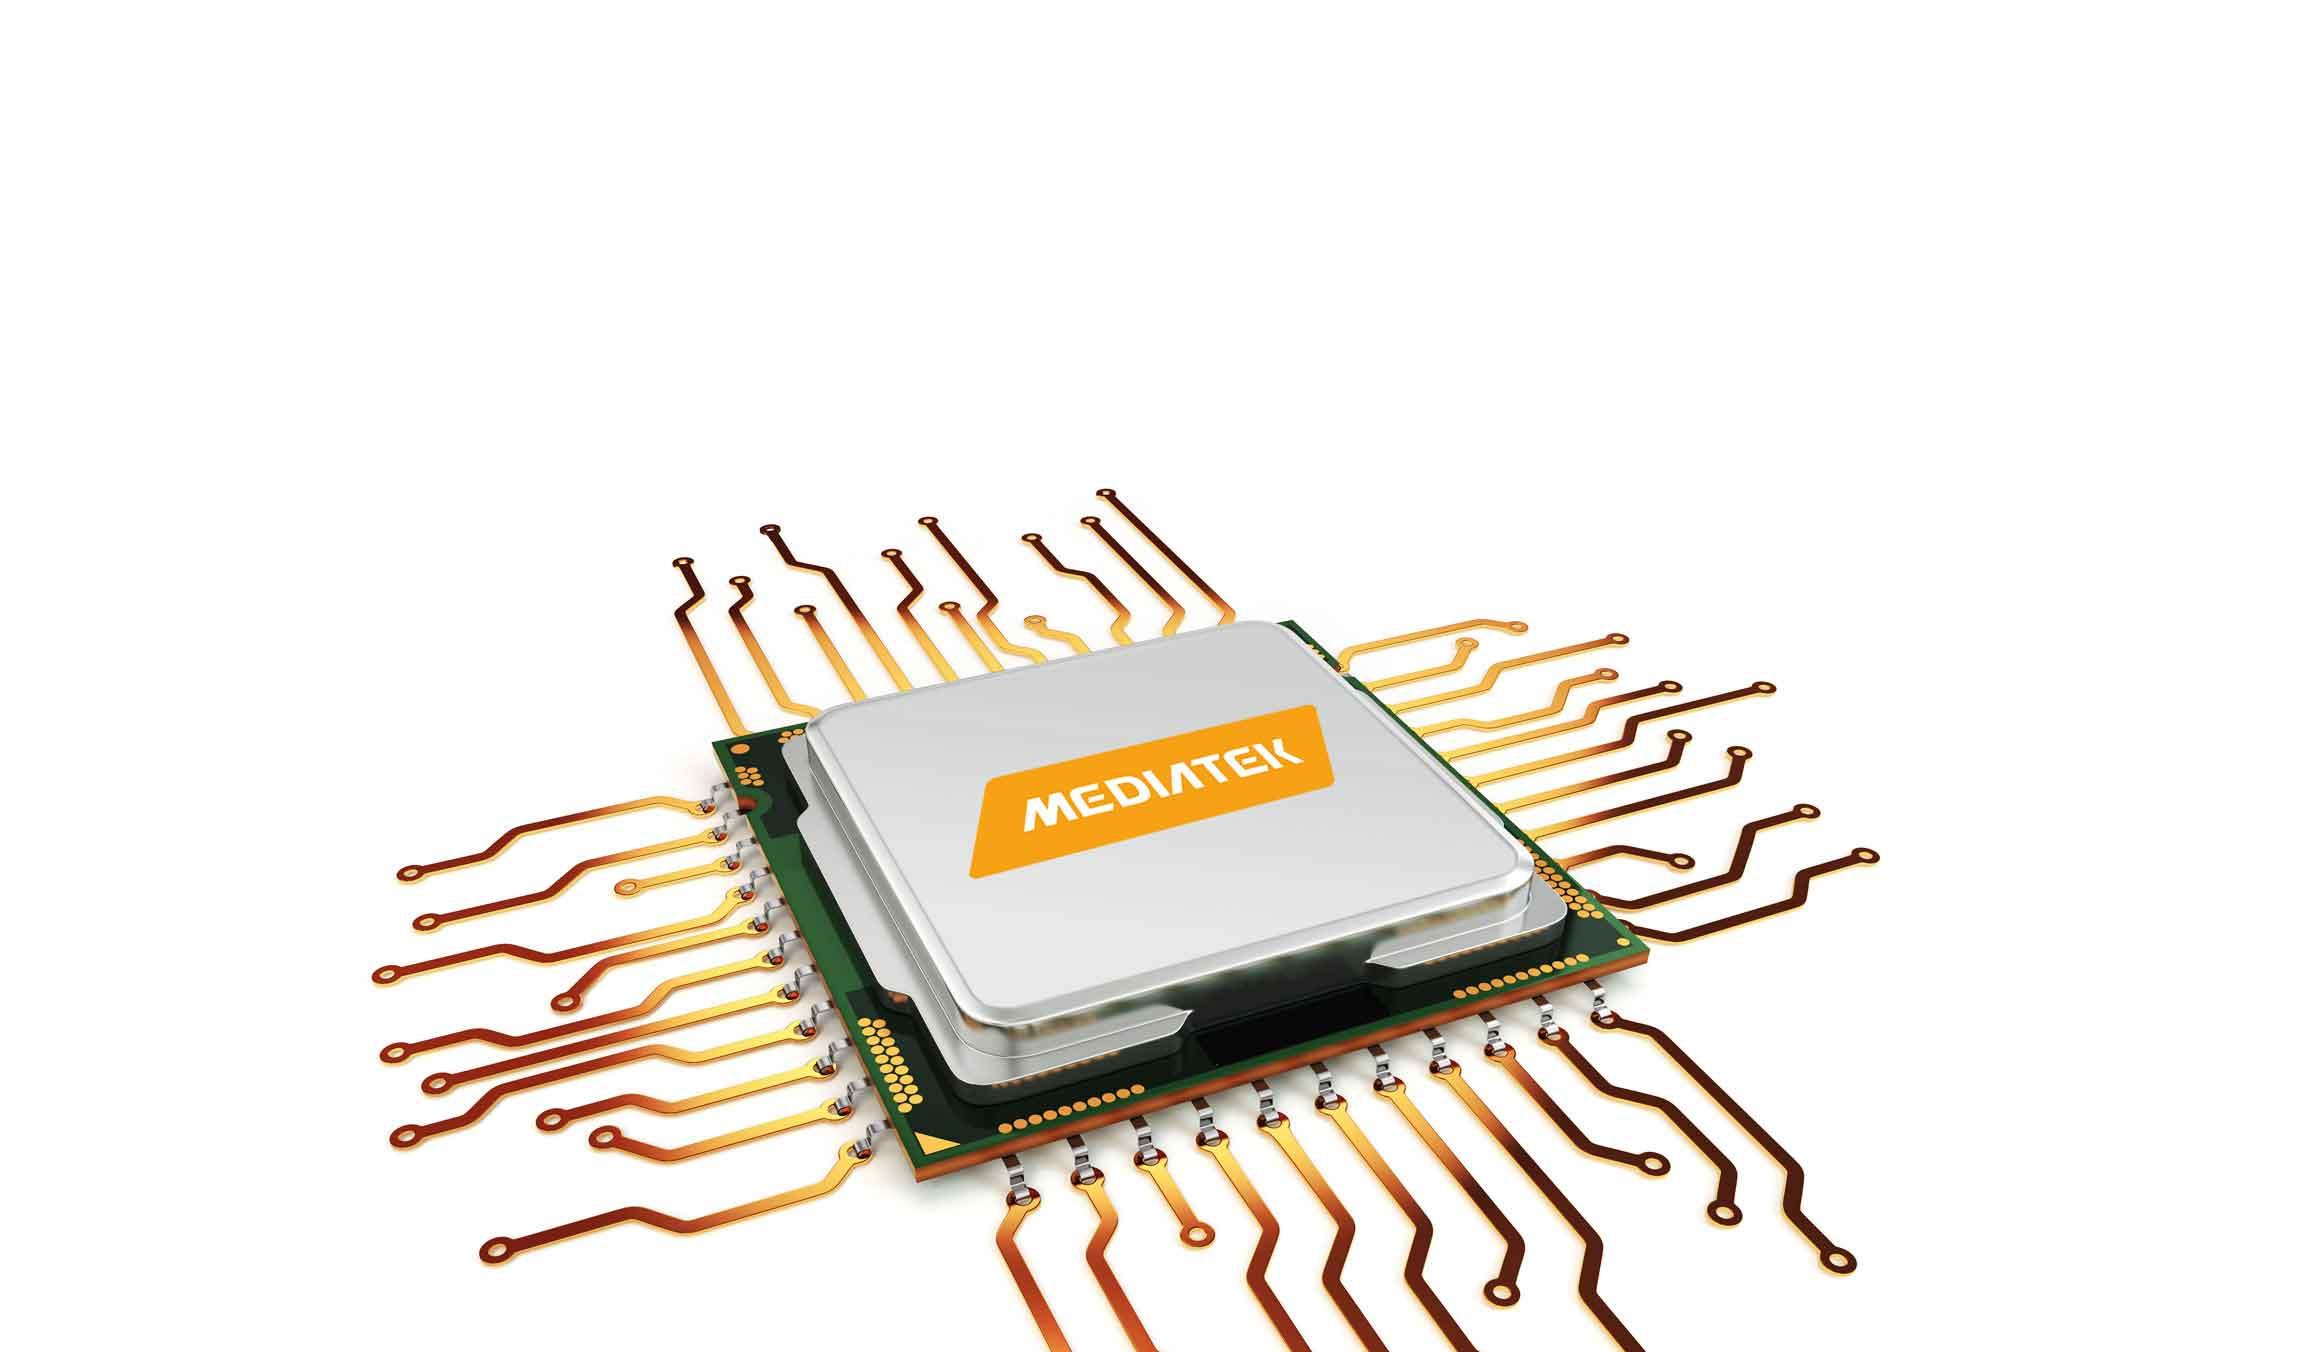 AT E500S processeur - گوشی موبایل انرجایزر مدل Energizer Energy E500S با ظرفیت ۸ گیگابایت